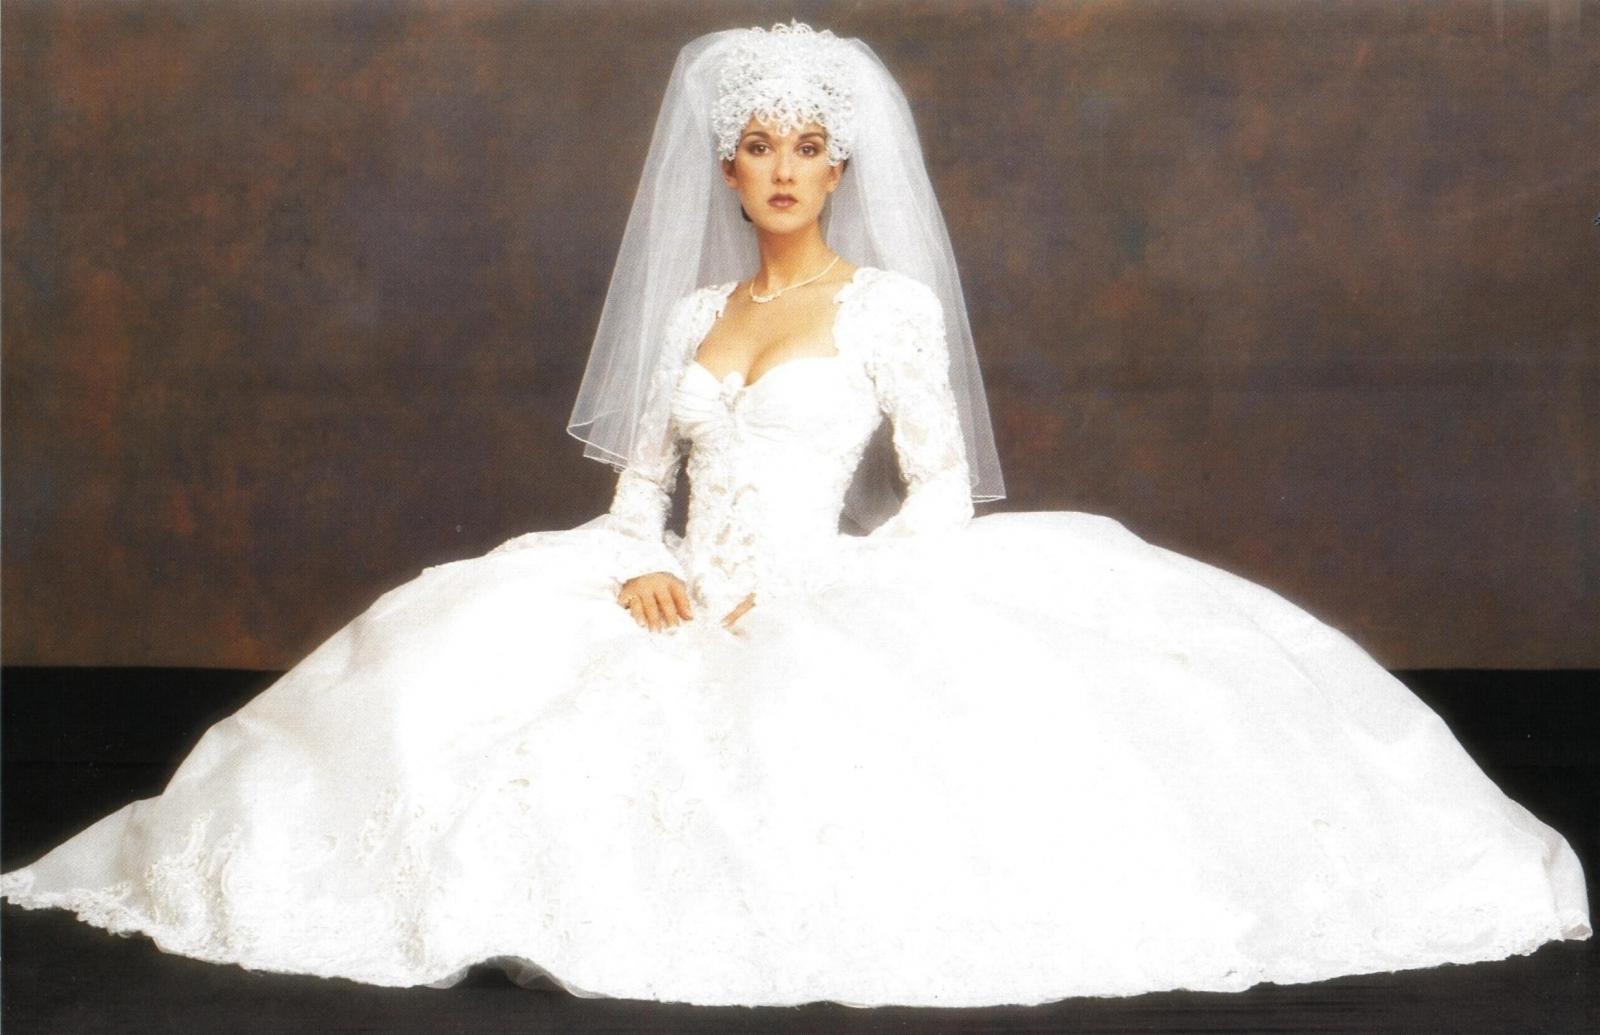 Celine Dion Wedding Dress 46275 Theweddingplans Celine Dion Wedding Dress Completely Elegant  Along With Fascinating   Celine Dion Wedding Dress Just For  Bridal Dress